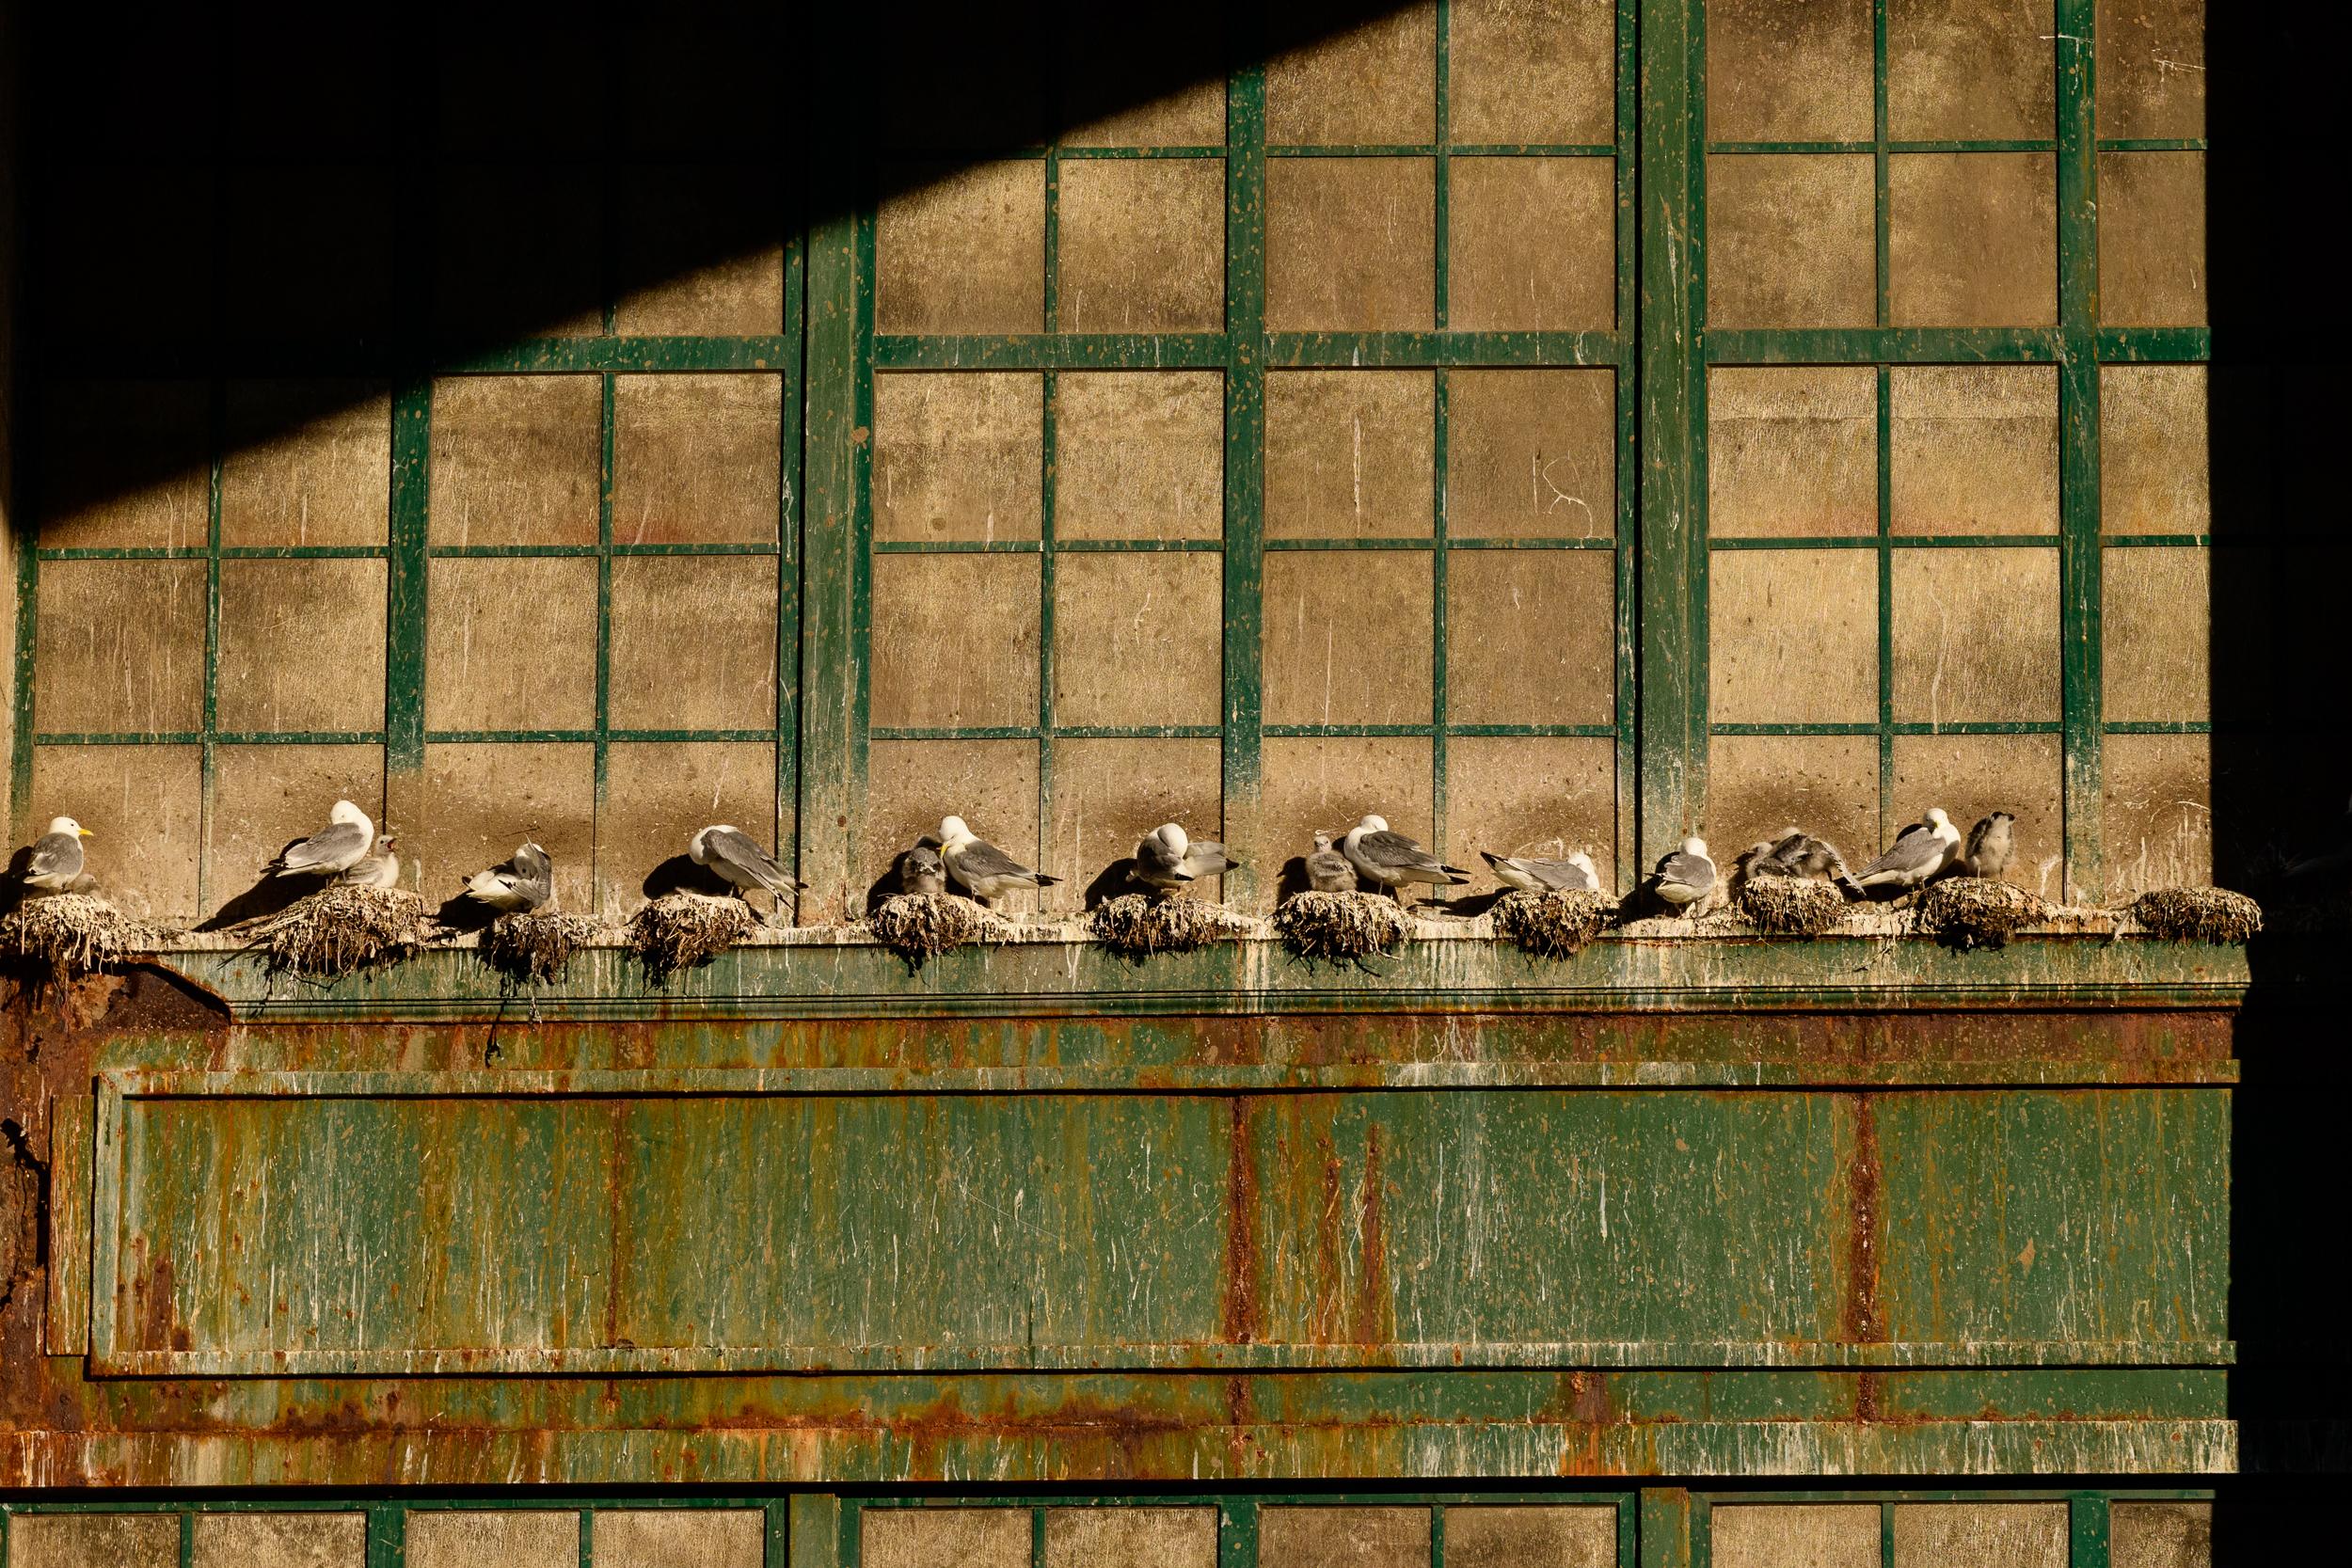 Black-legged kittiwake (Rissa tridactyla) adults and chicks on nests on the Tyne Bridge. Newcastle, UK. July. Cropped